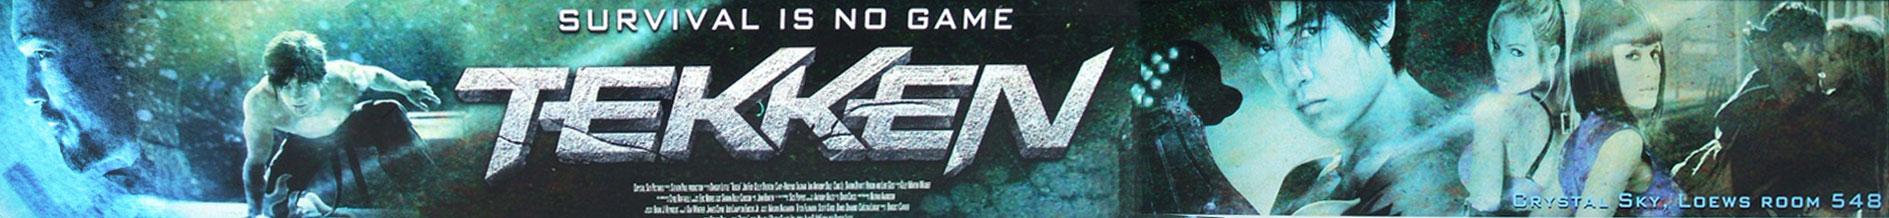 плакат фильма баннер Теккен